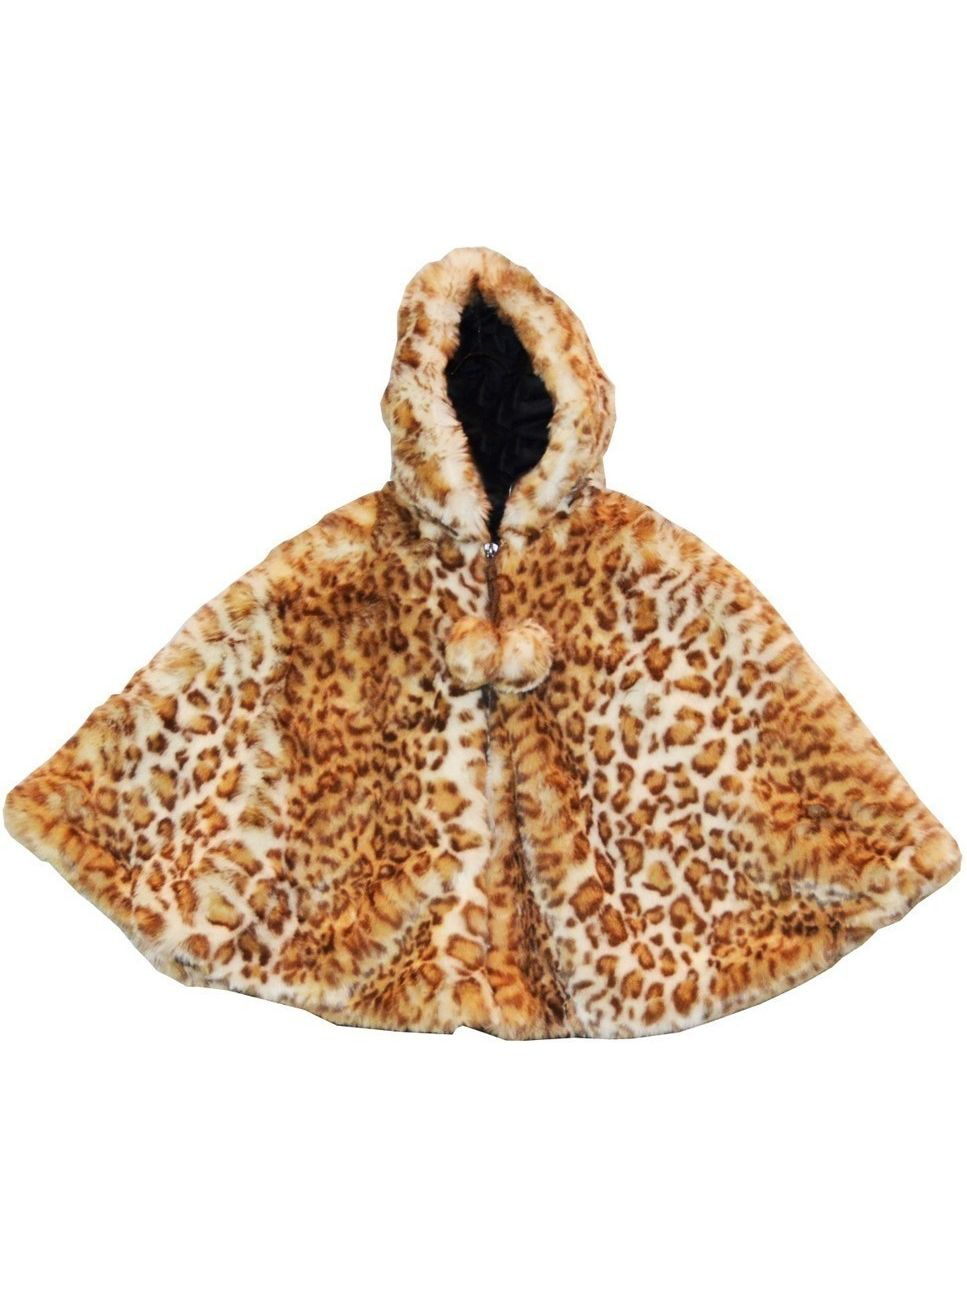 Little Girls Snow Leopard Faux Fur Poncho 1T-6